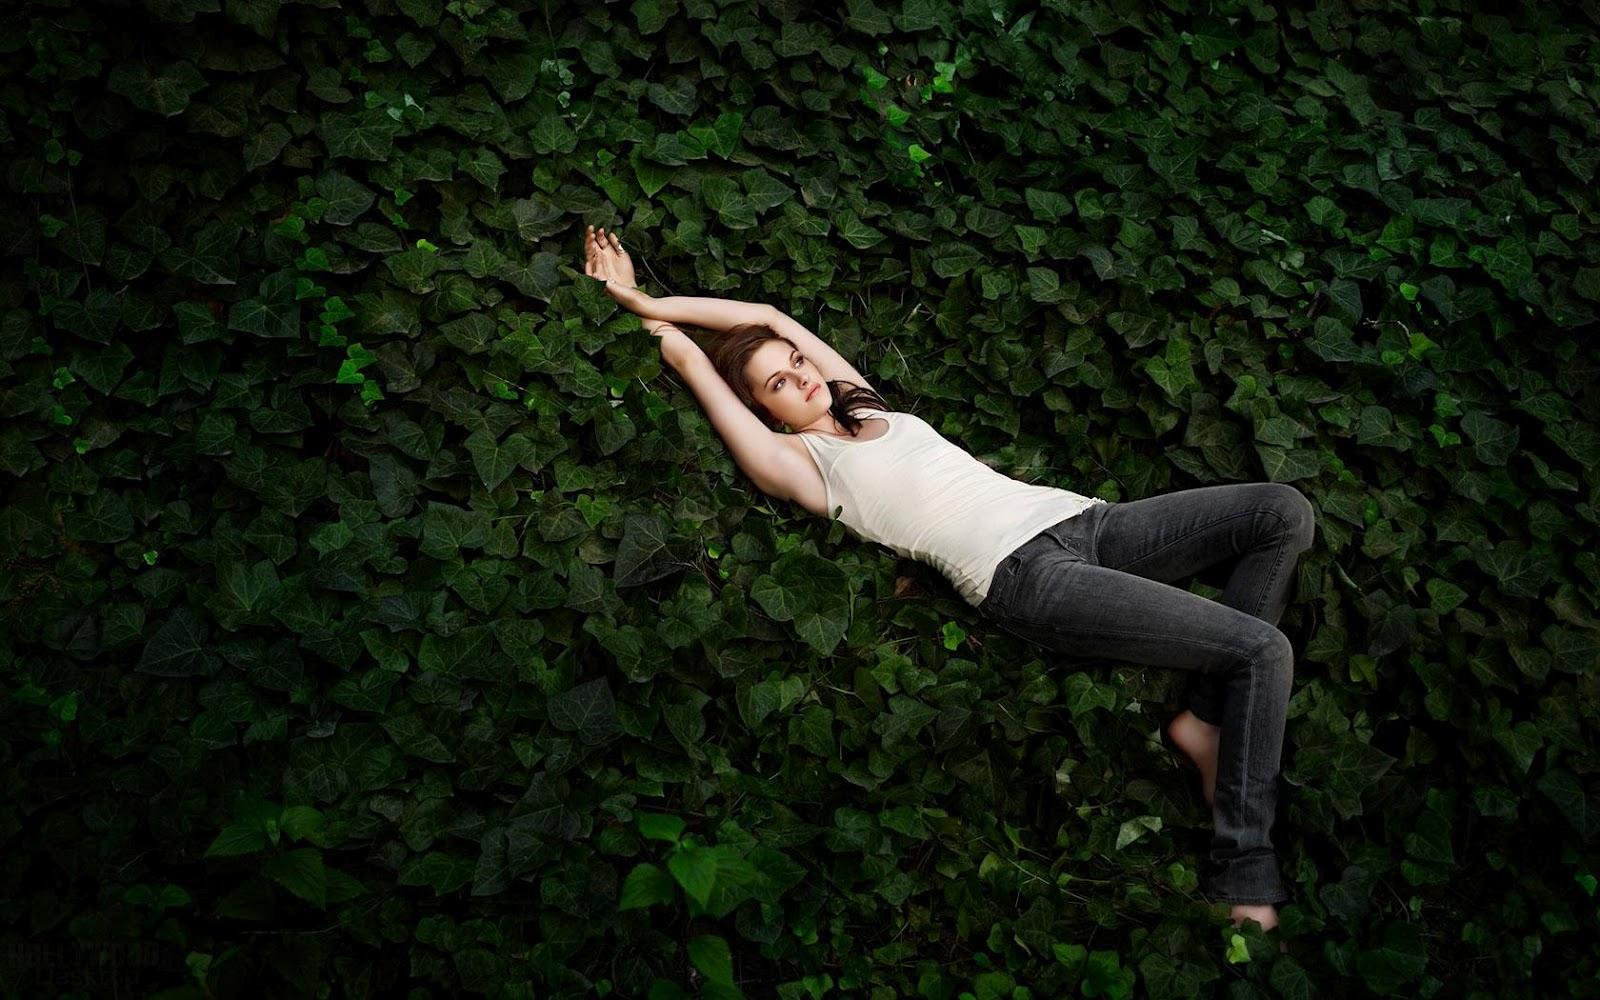 Kristen Stewart Hd Wallpapers Mobile Wallpapers